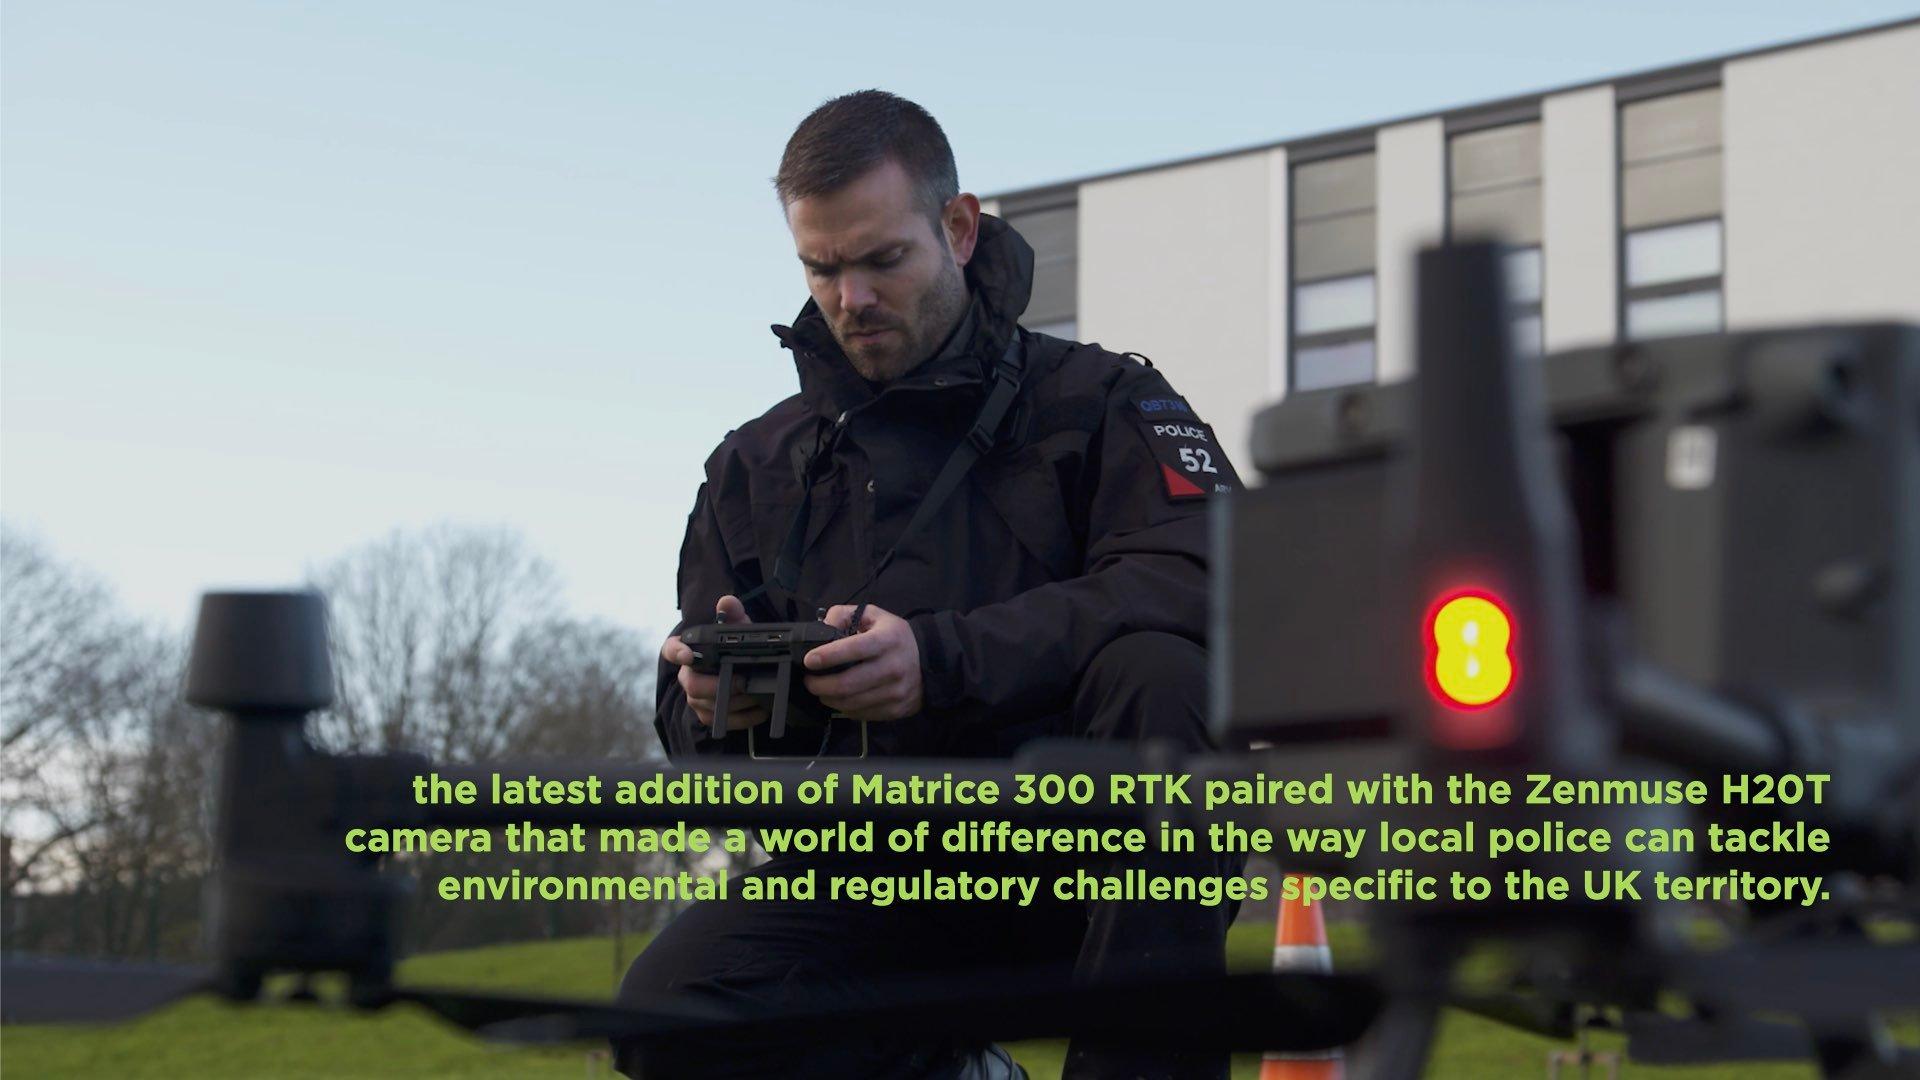 UK Police Upgrading to the Matrice 300 RTK drone